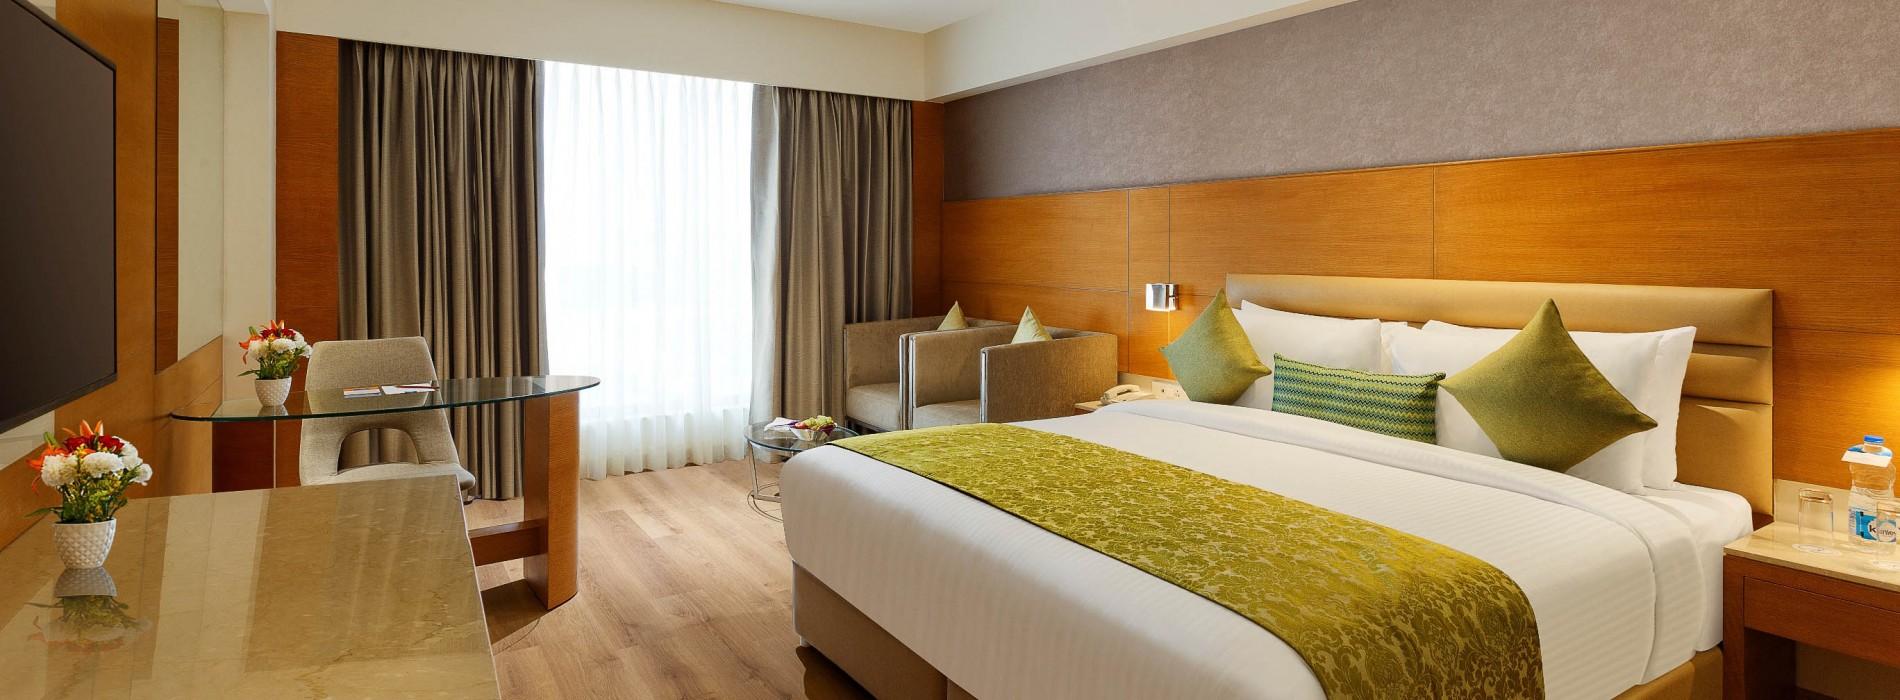 Sarovar Hotels & Resorts opens Jhansi's first branded hotel